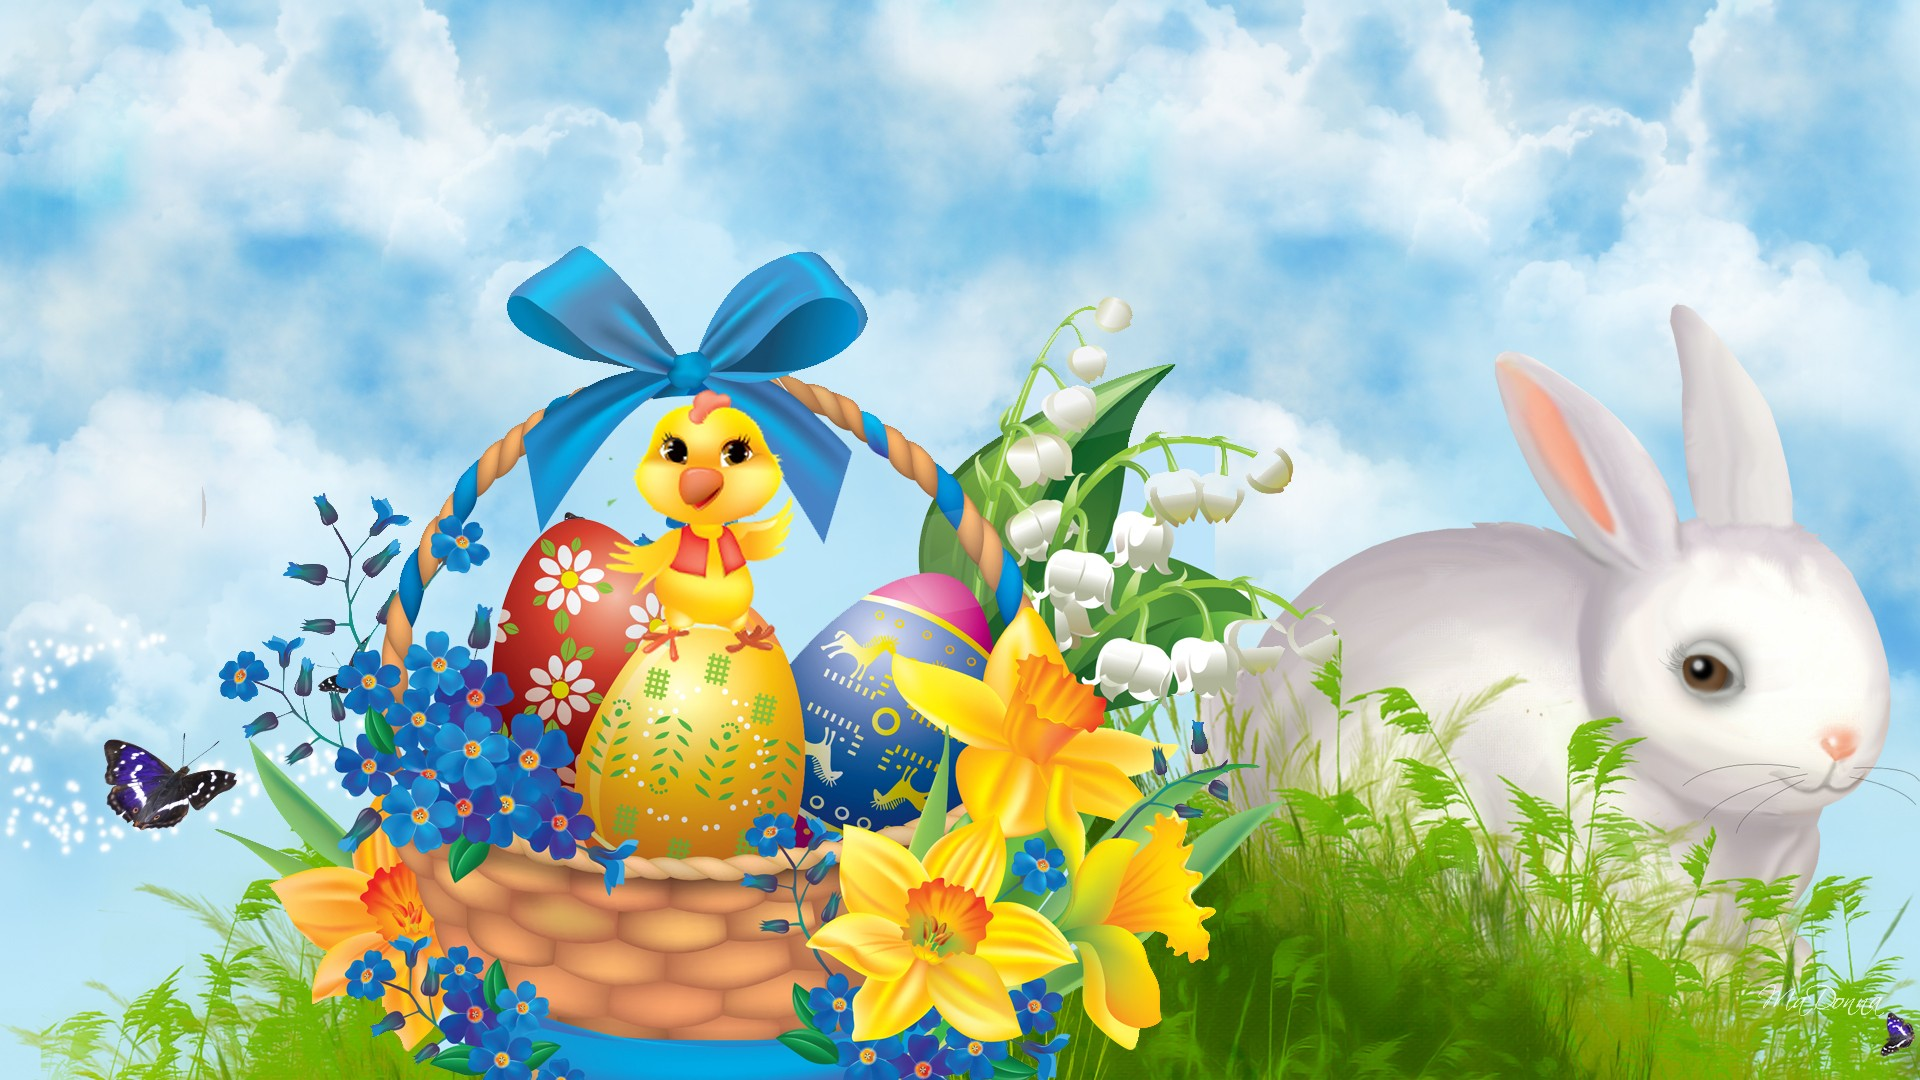 HD Bunnies And Easter Wallpapers Desktop Backgrounds Funmole 1920x1080